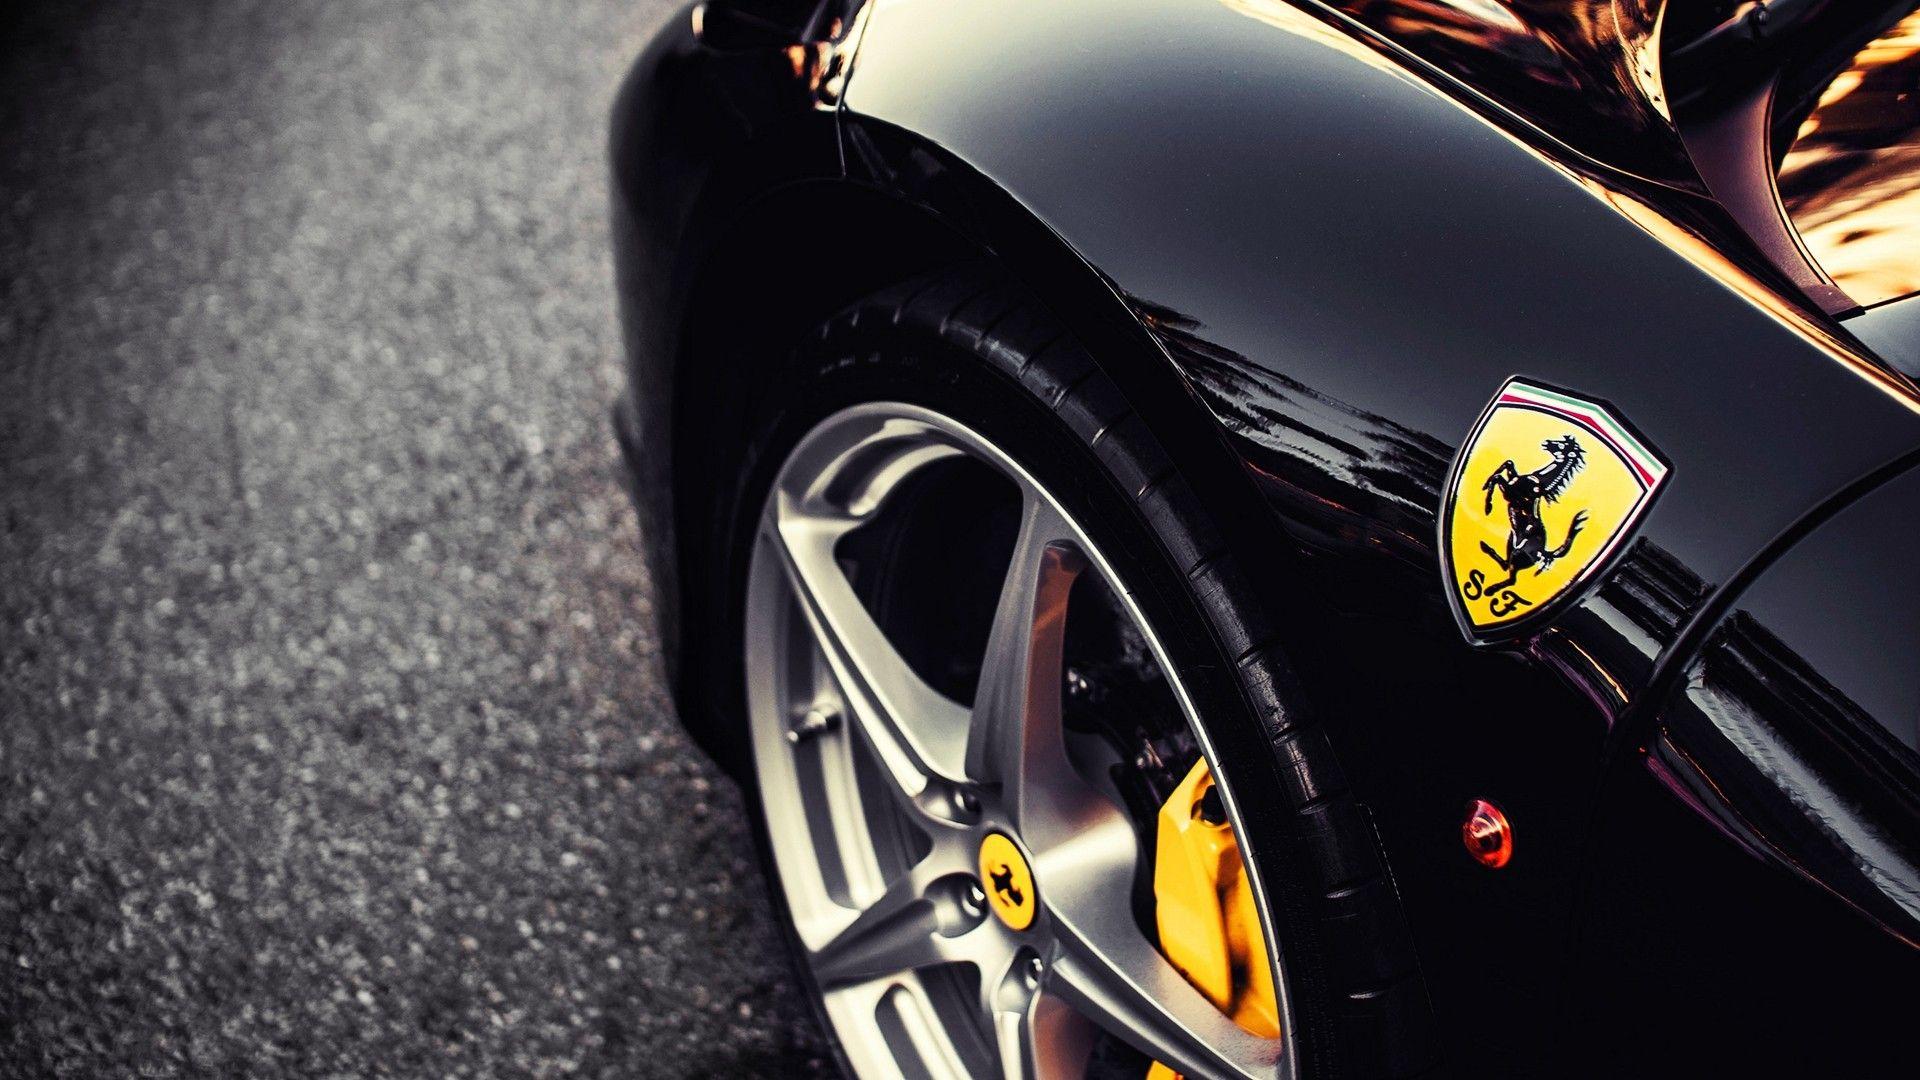 Ferrari Emblem Hd 1080p Wallpapers Download Sexiest Cars Around